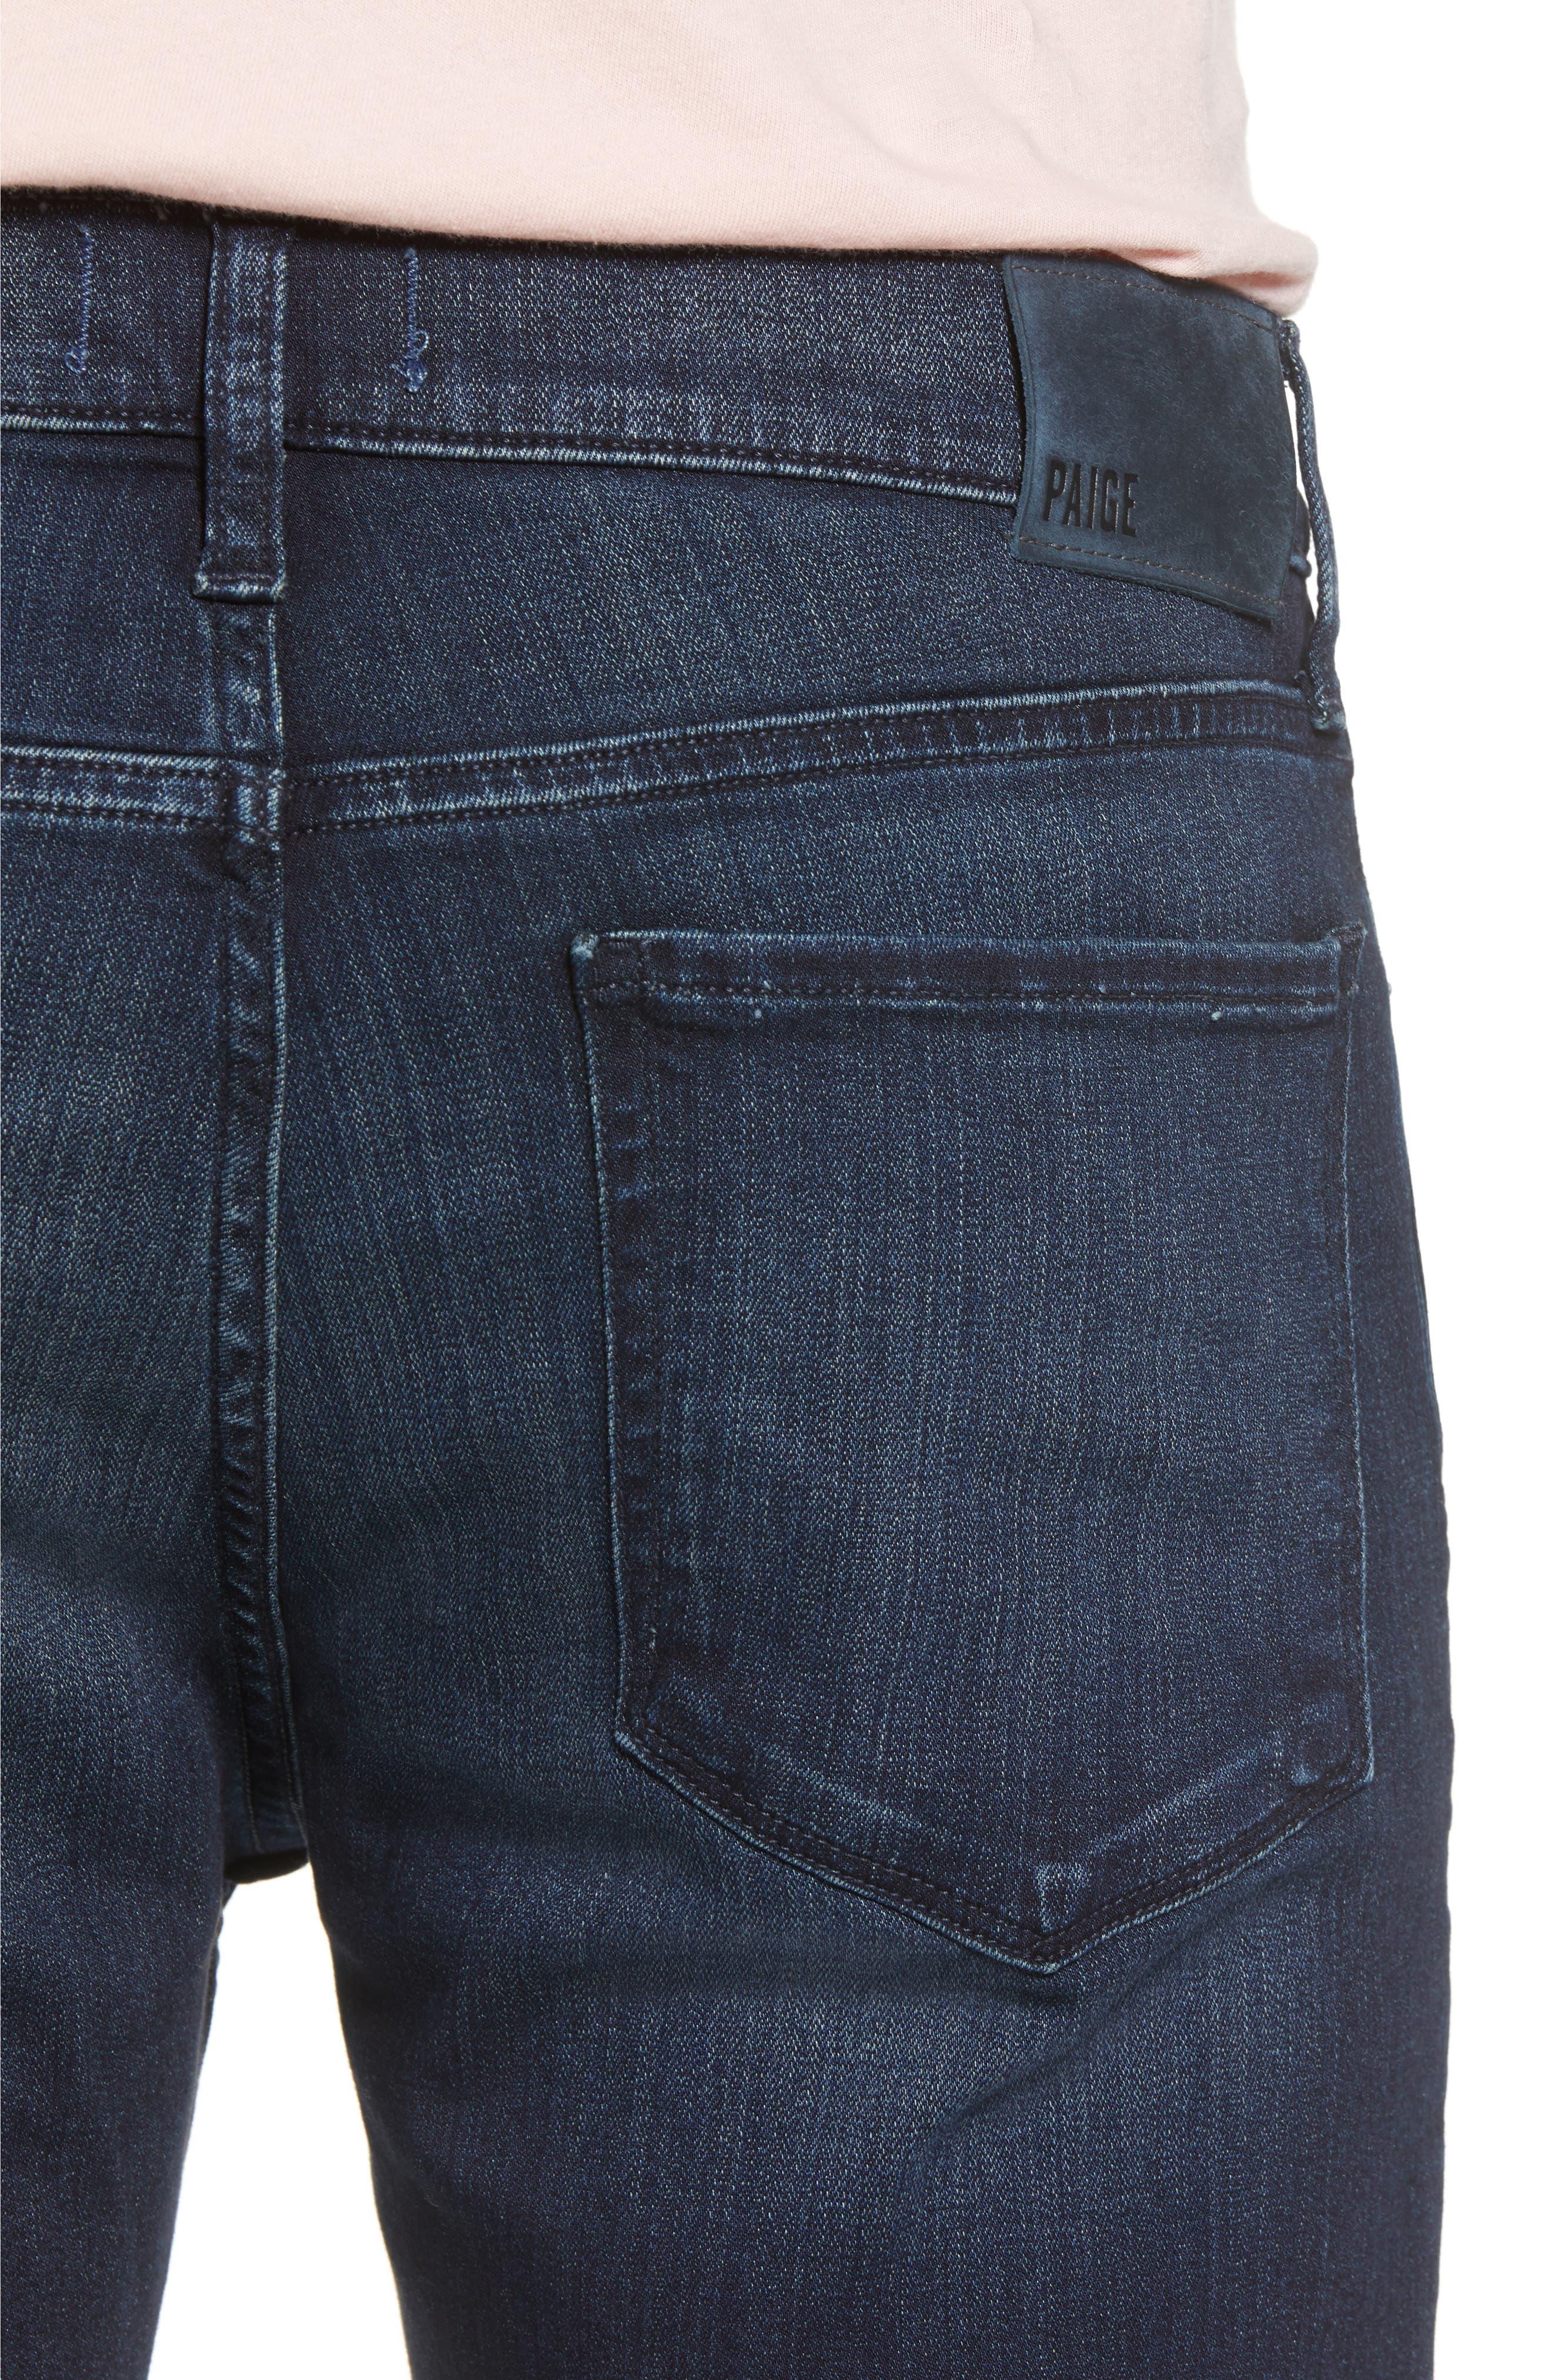 Lennox Slim Fit Jeans,                             Alternate thumbnail 4, color,                             DORSET